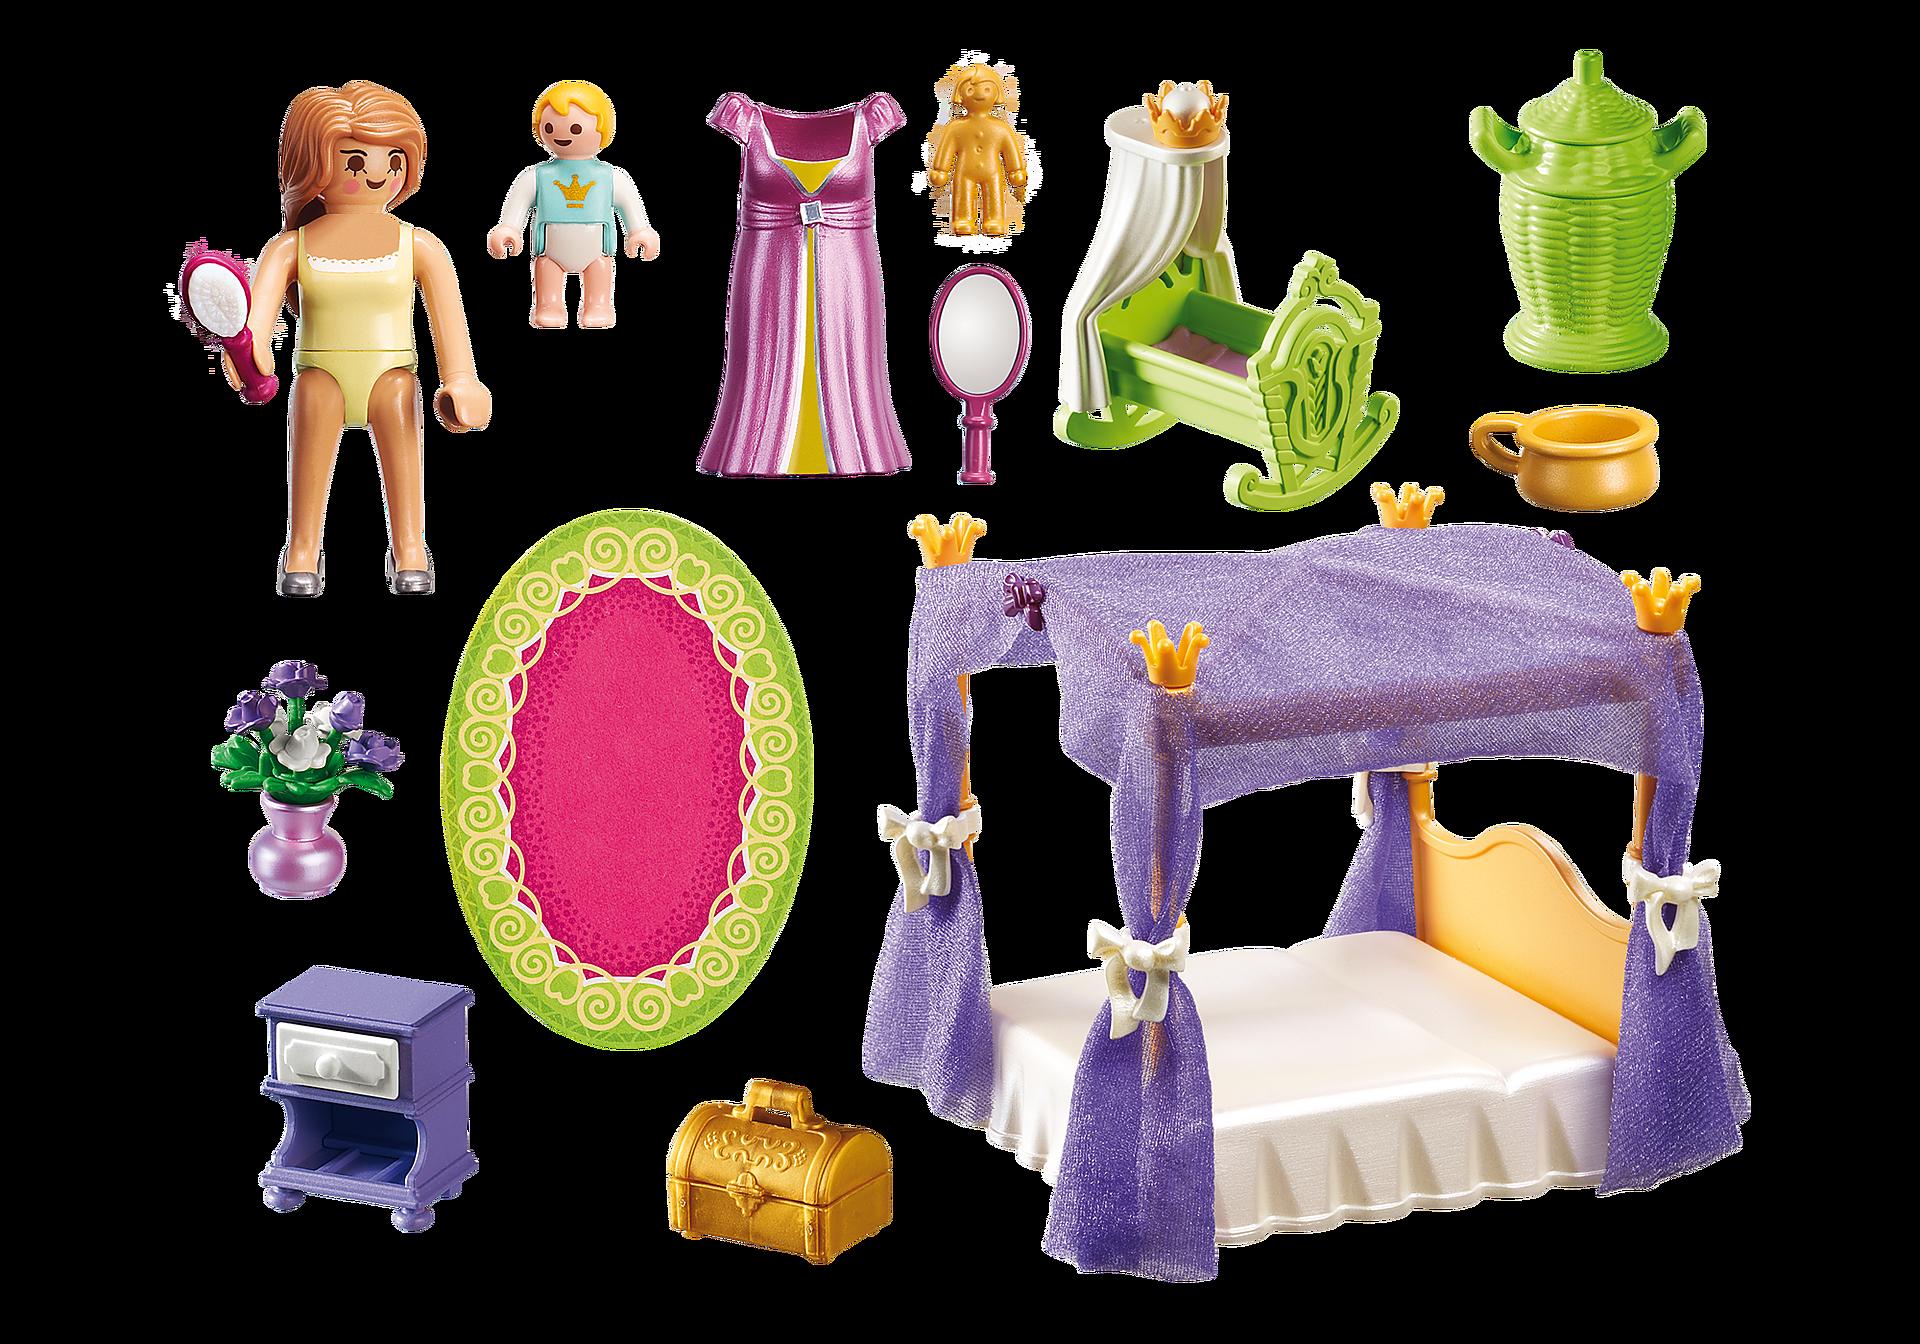 6851 Princess Chamber with Cradle zoom image4